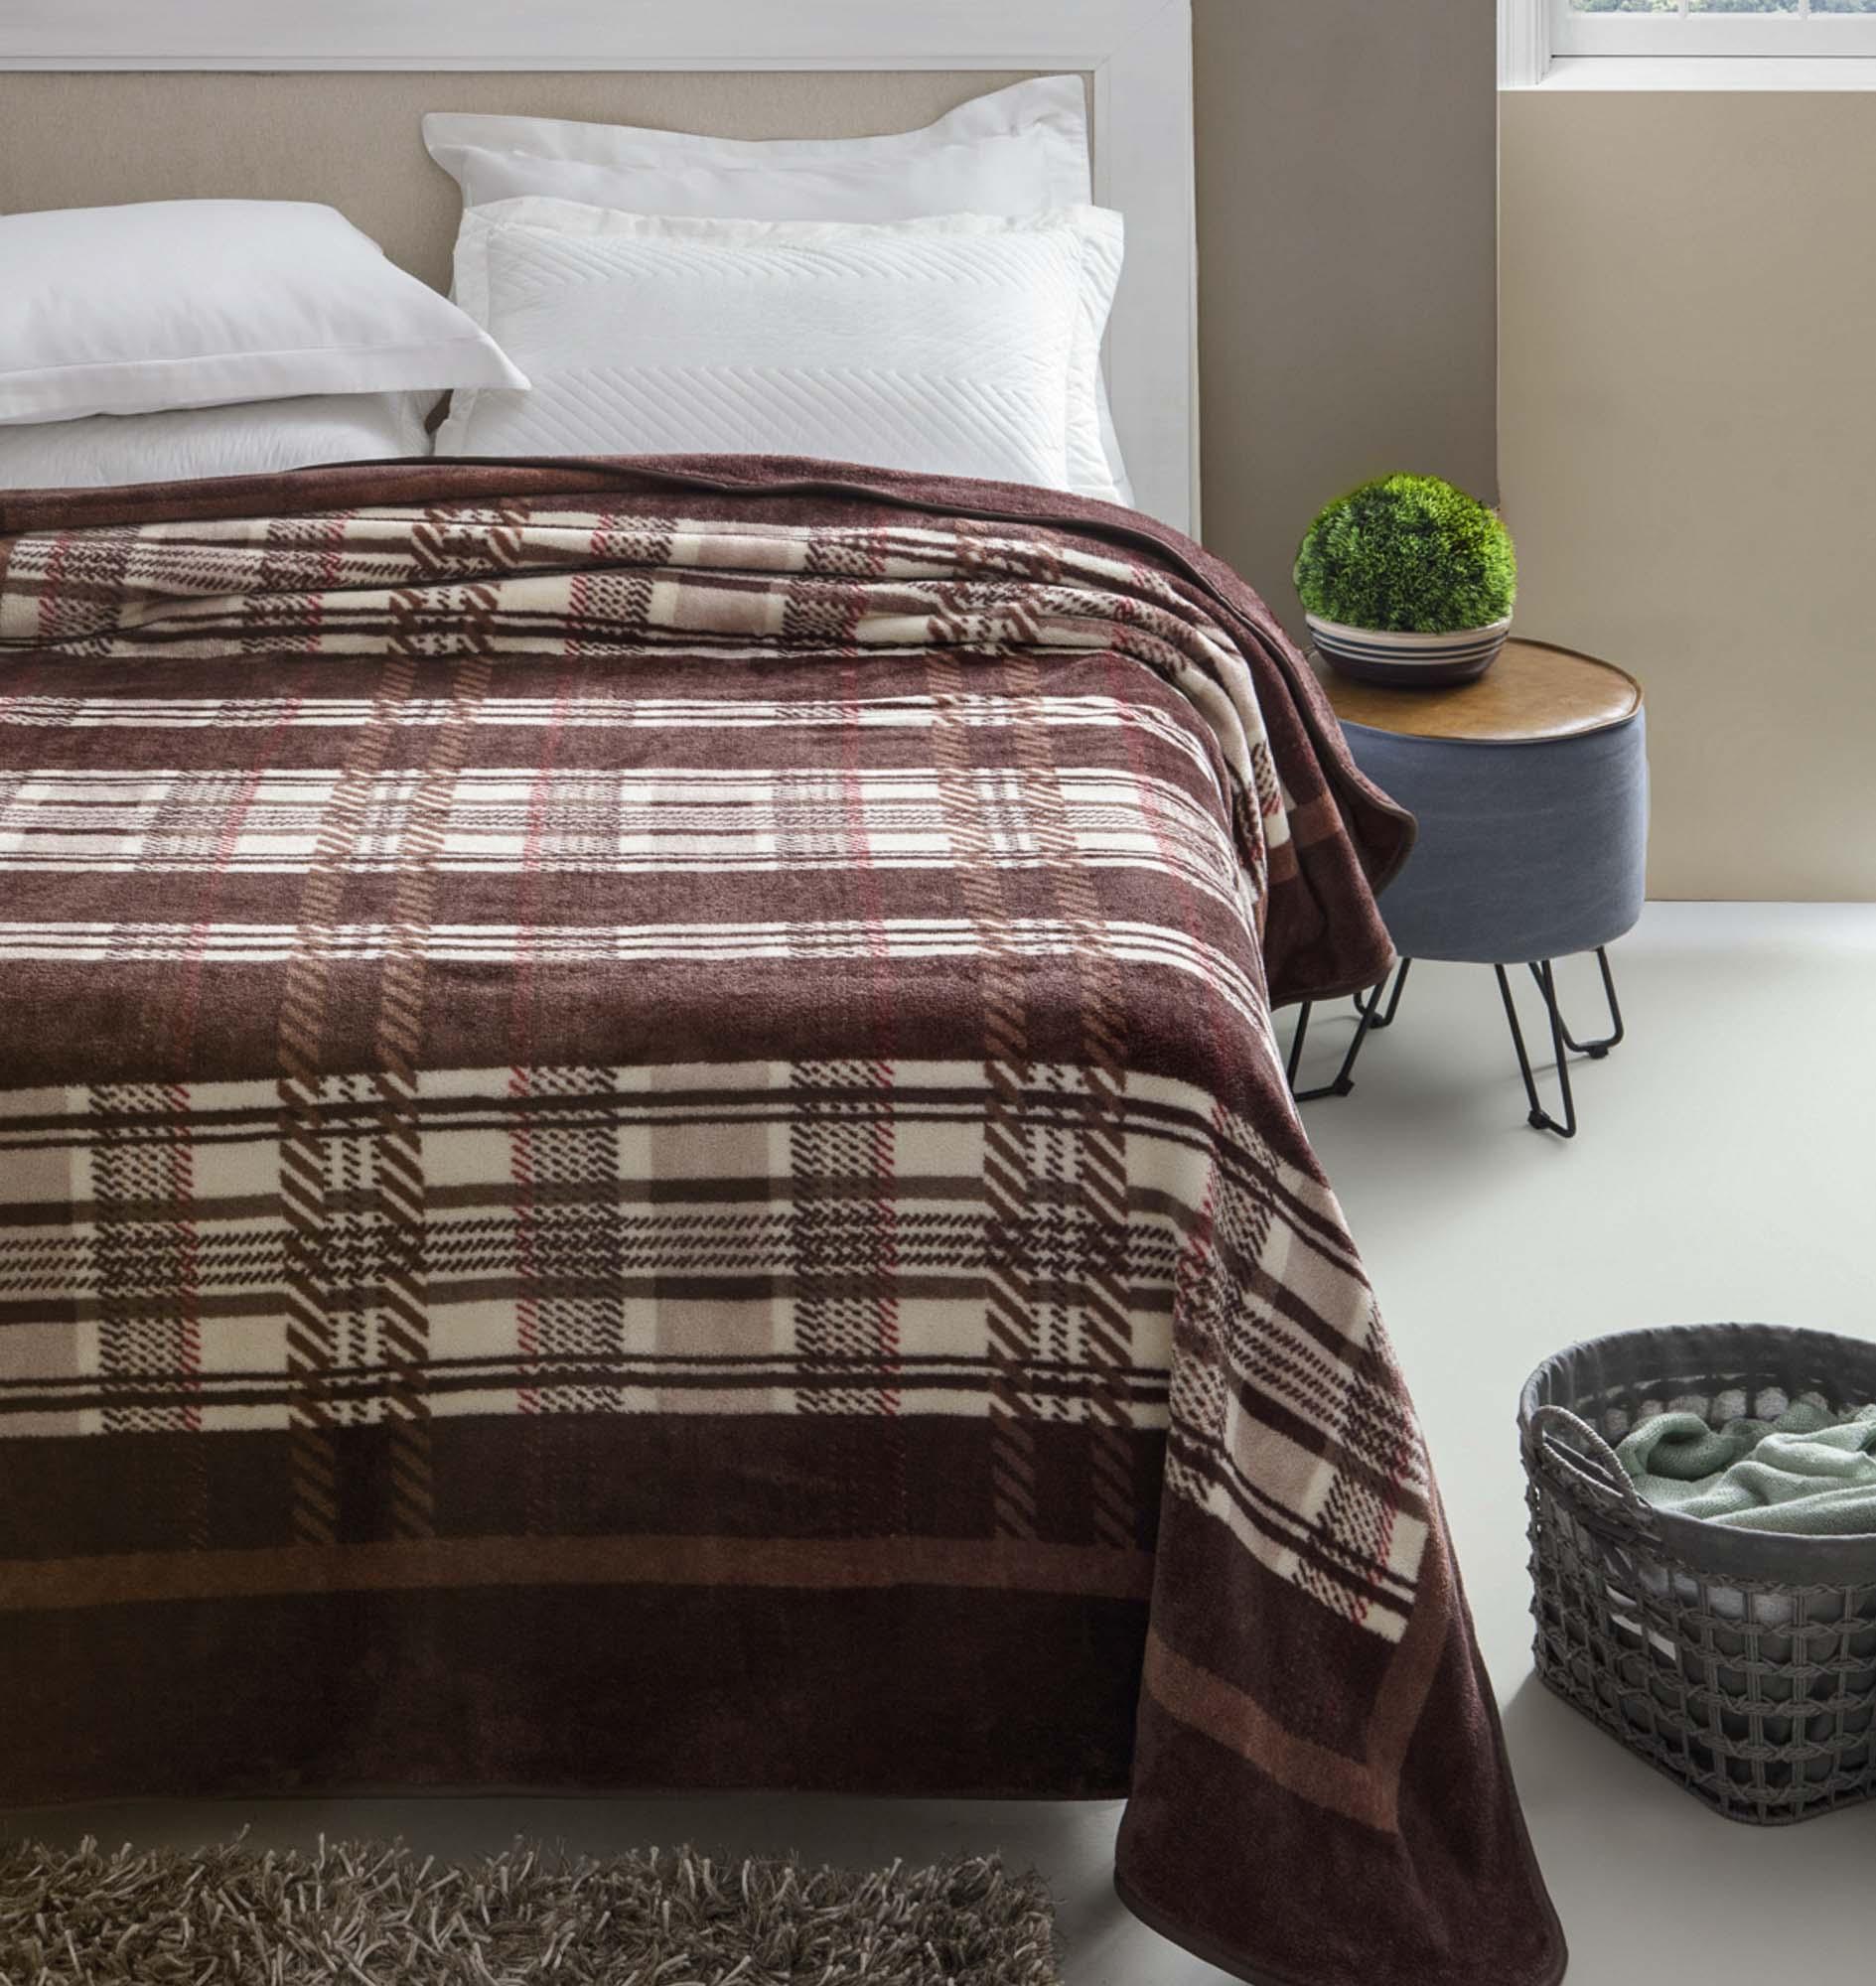 Cobertor Jolitex Casal Kyor Plus 1,80x2,20m Arezzo Marrom